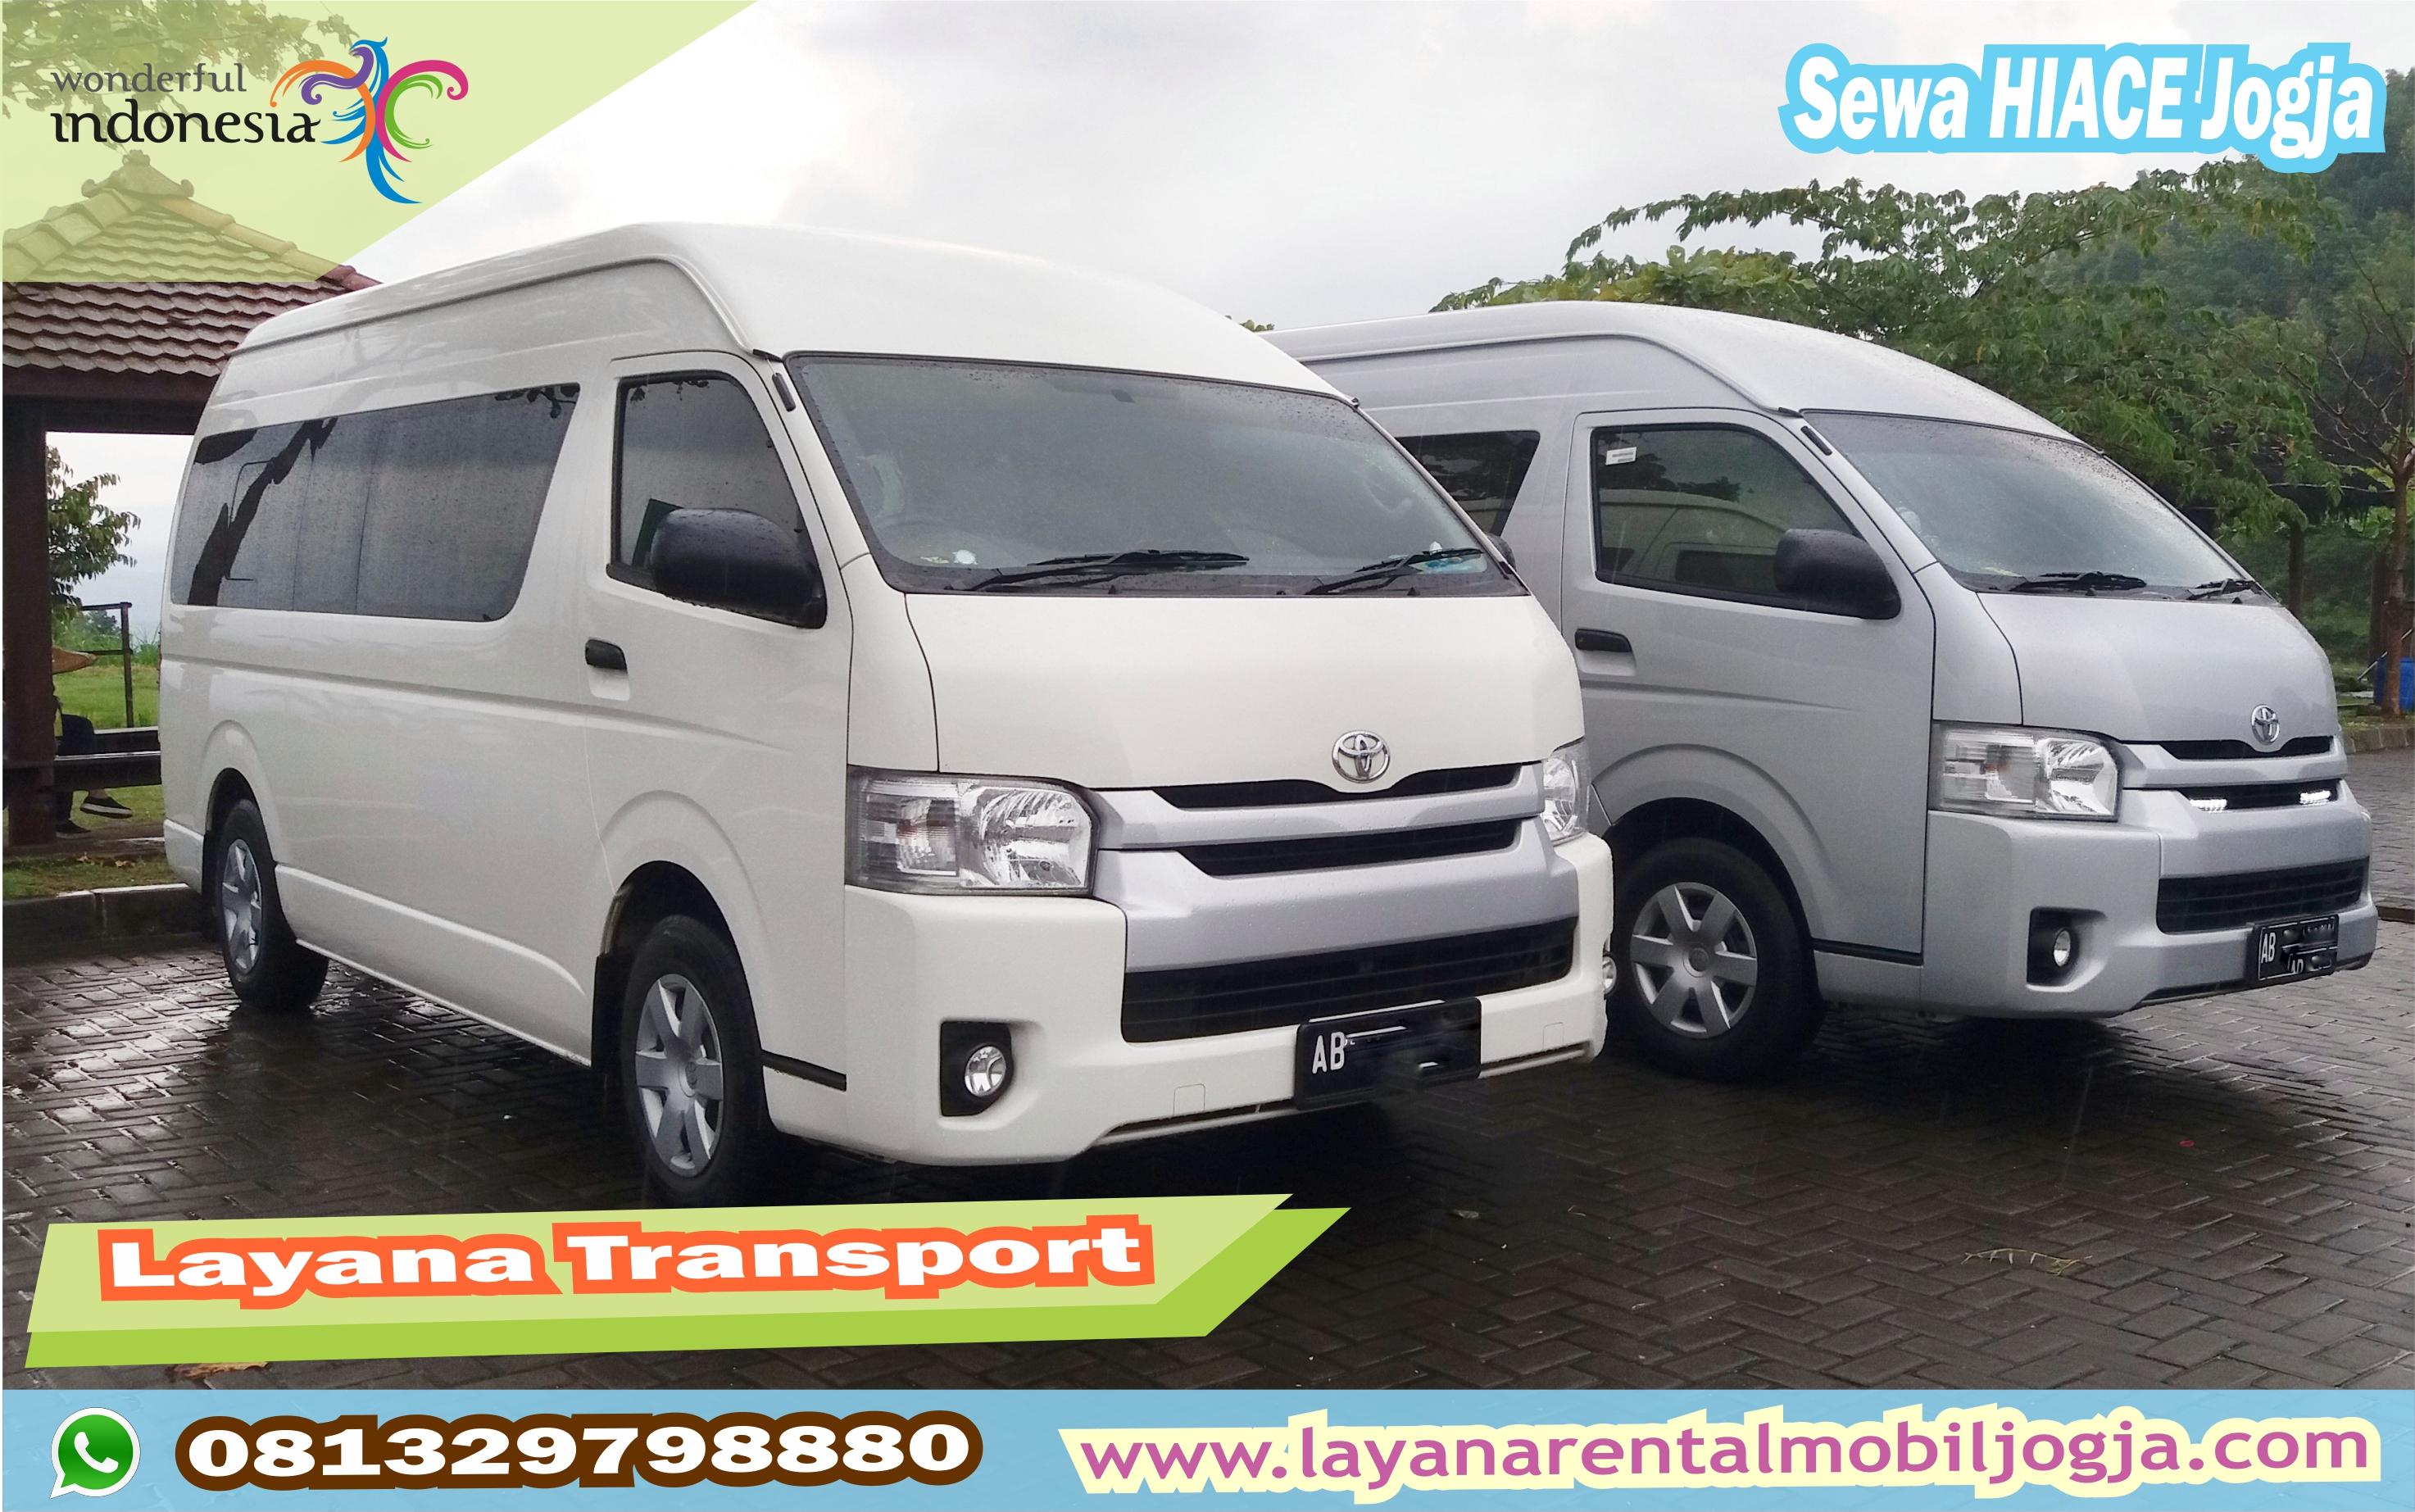 Mobil Wisata Hiace & ELF di Jogja || 10-19 seat | Layana Transport - Sewa menyewa jadi lebih mudah di Spotsewa